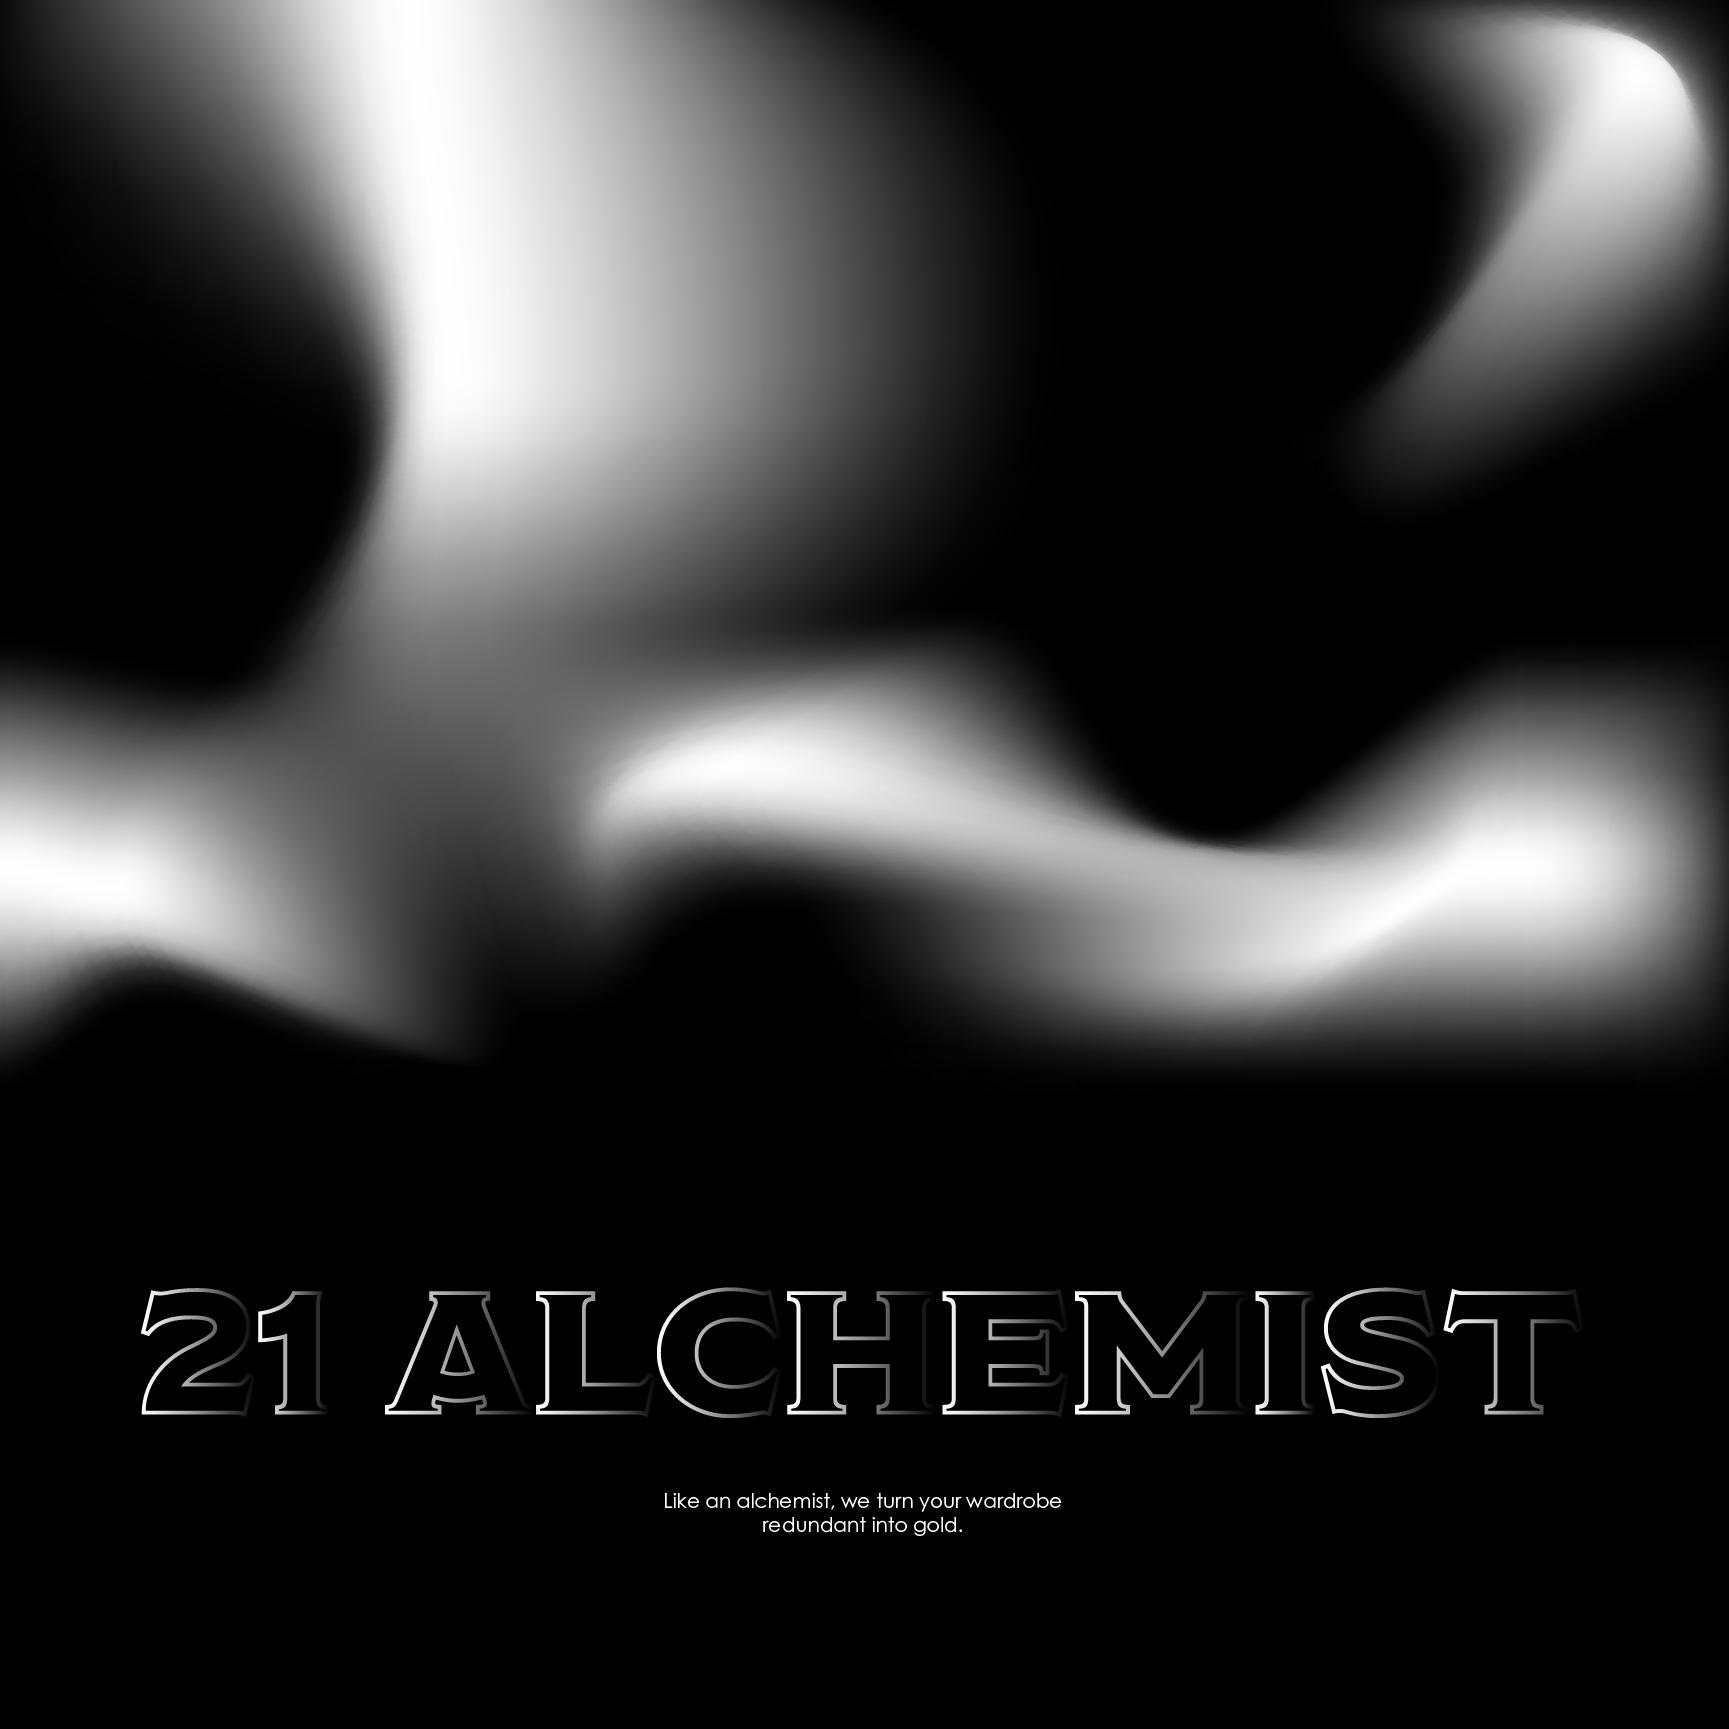 21 Alchemist tagline visuals.